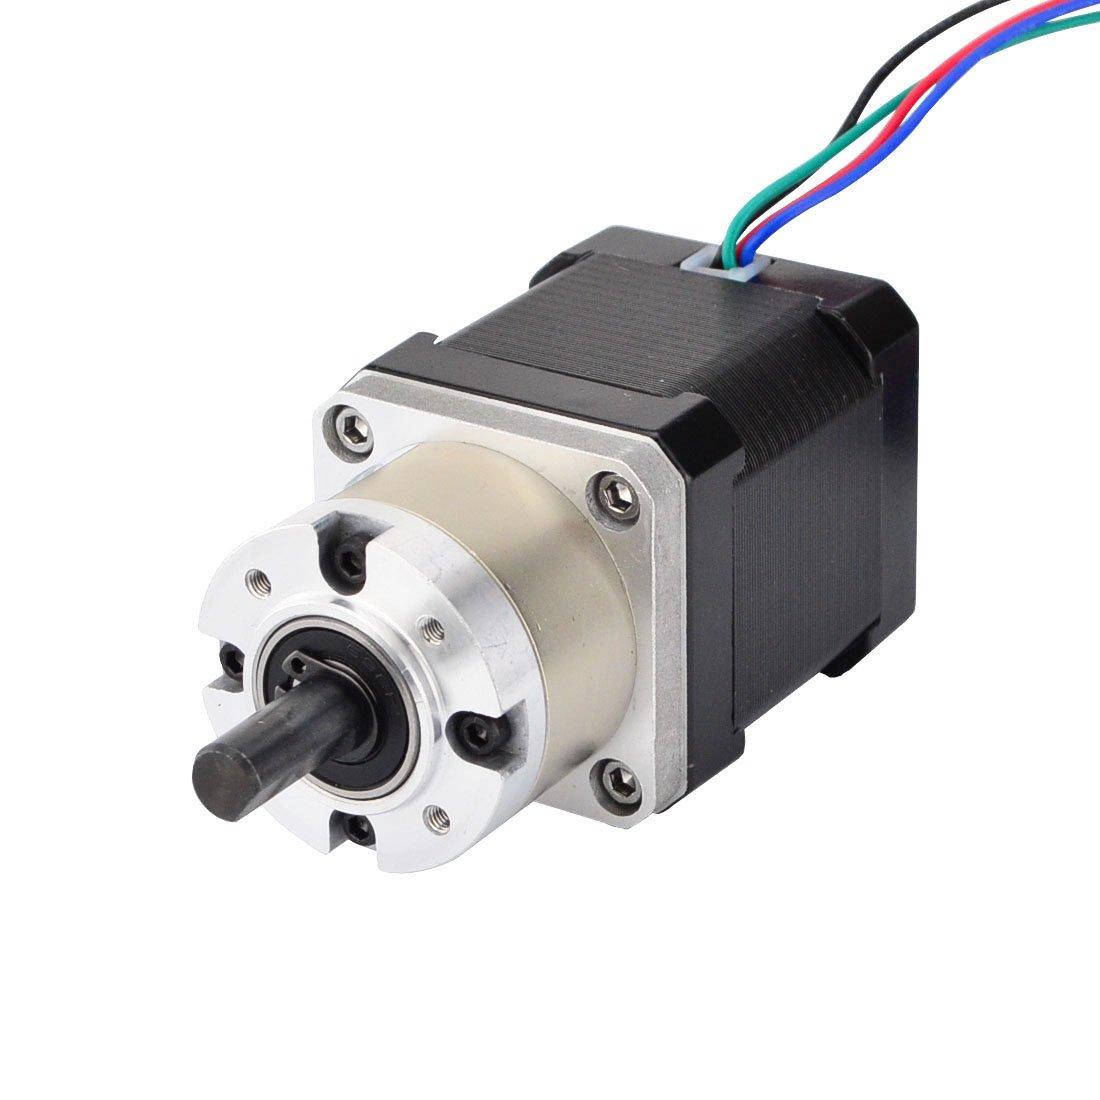 Nema 17 Geared Stepper Motor Gear Ratio 5:1 3D Printer Extruder Motor DIY CNC Robotics